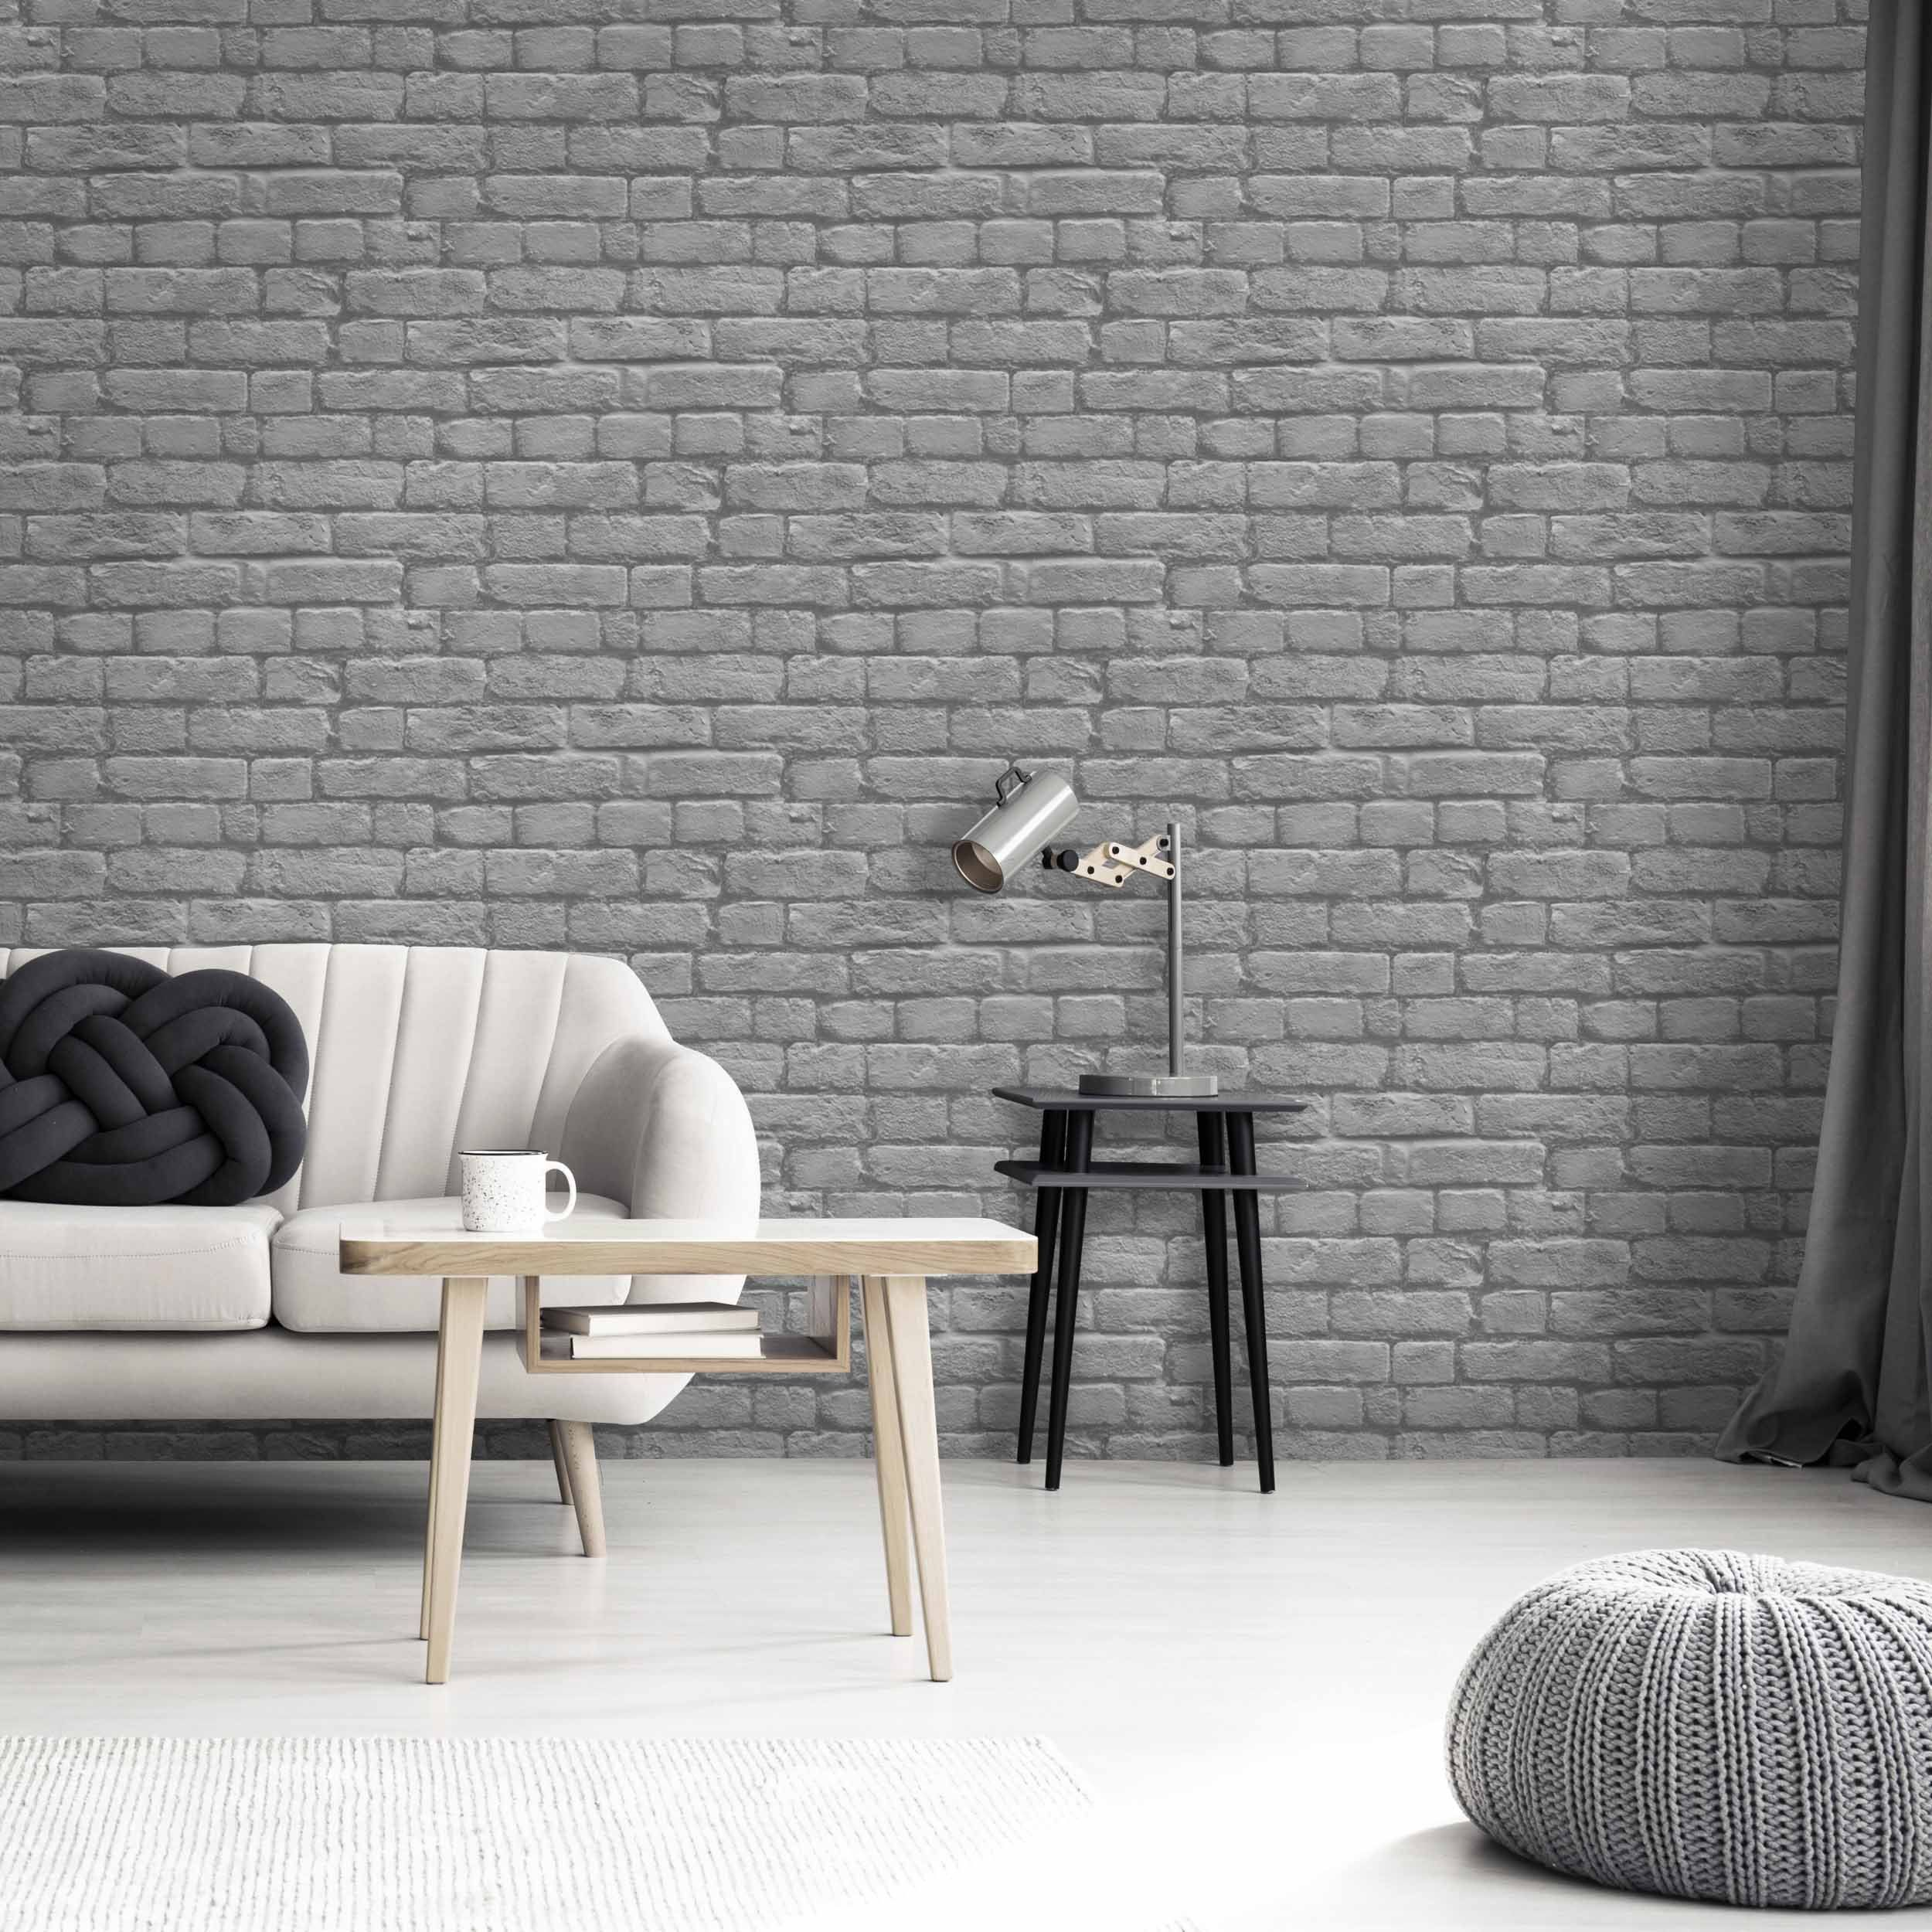 Charcoal Brick by Woodchip & Magnolia Brick interior